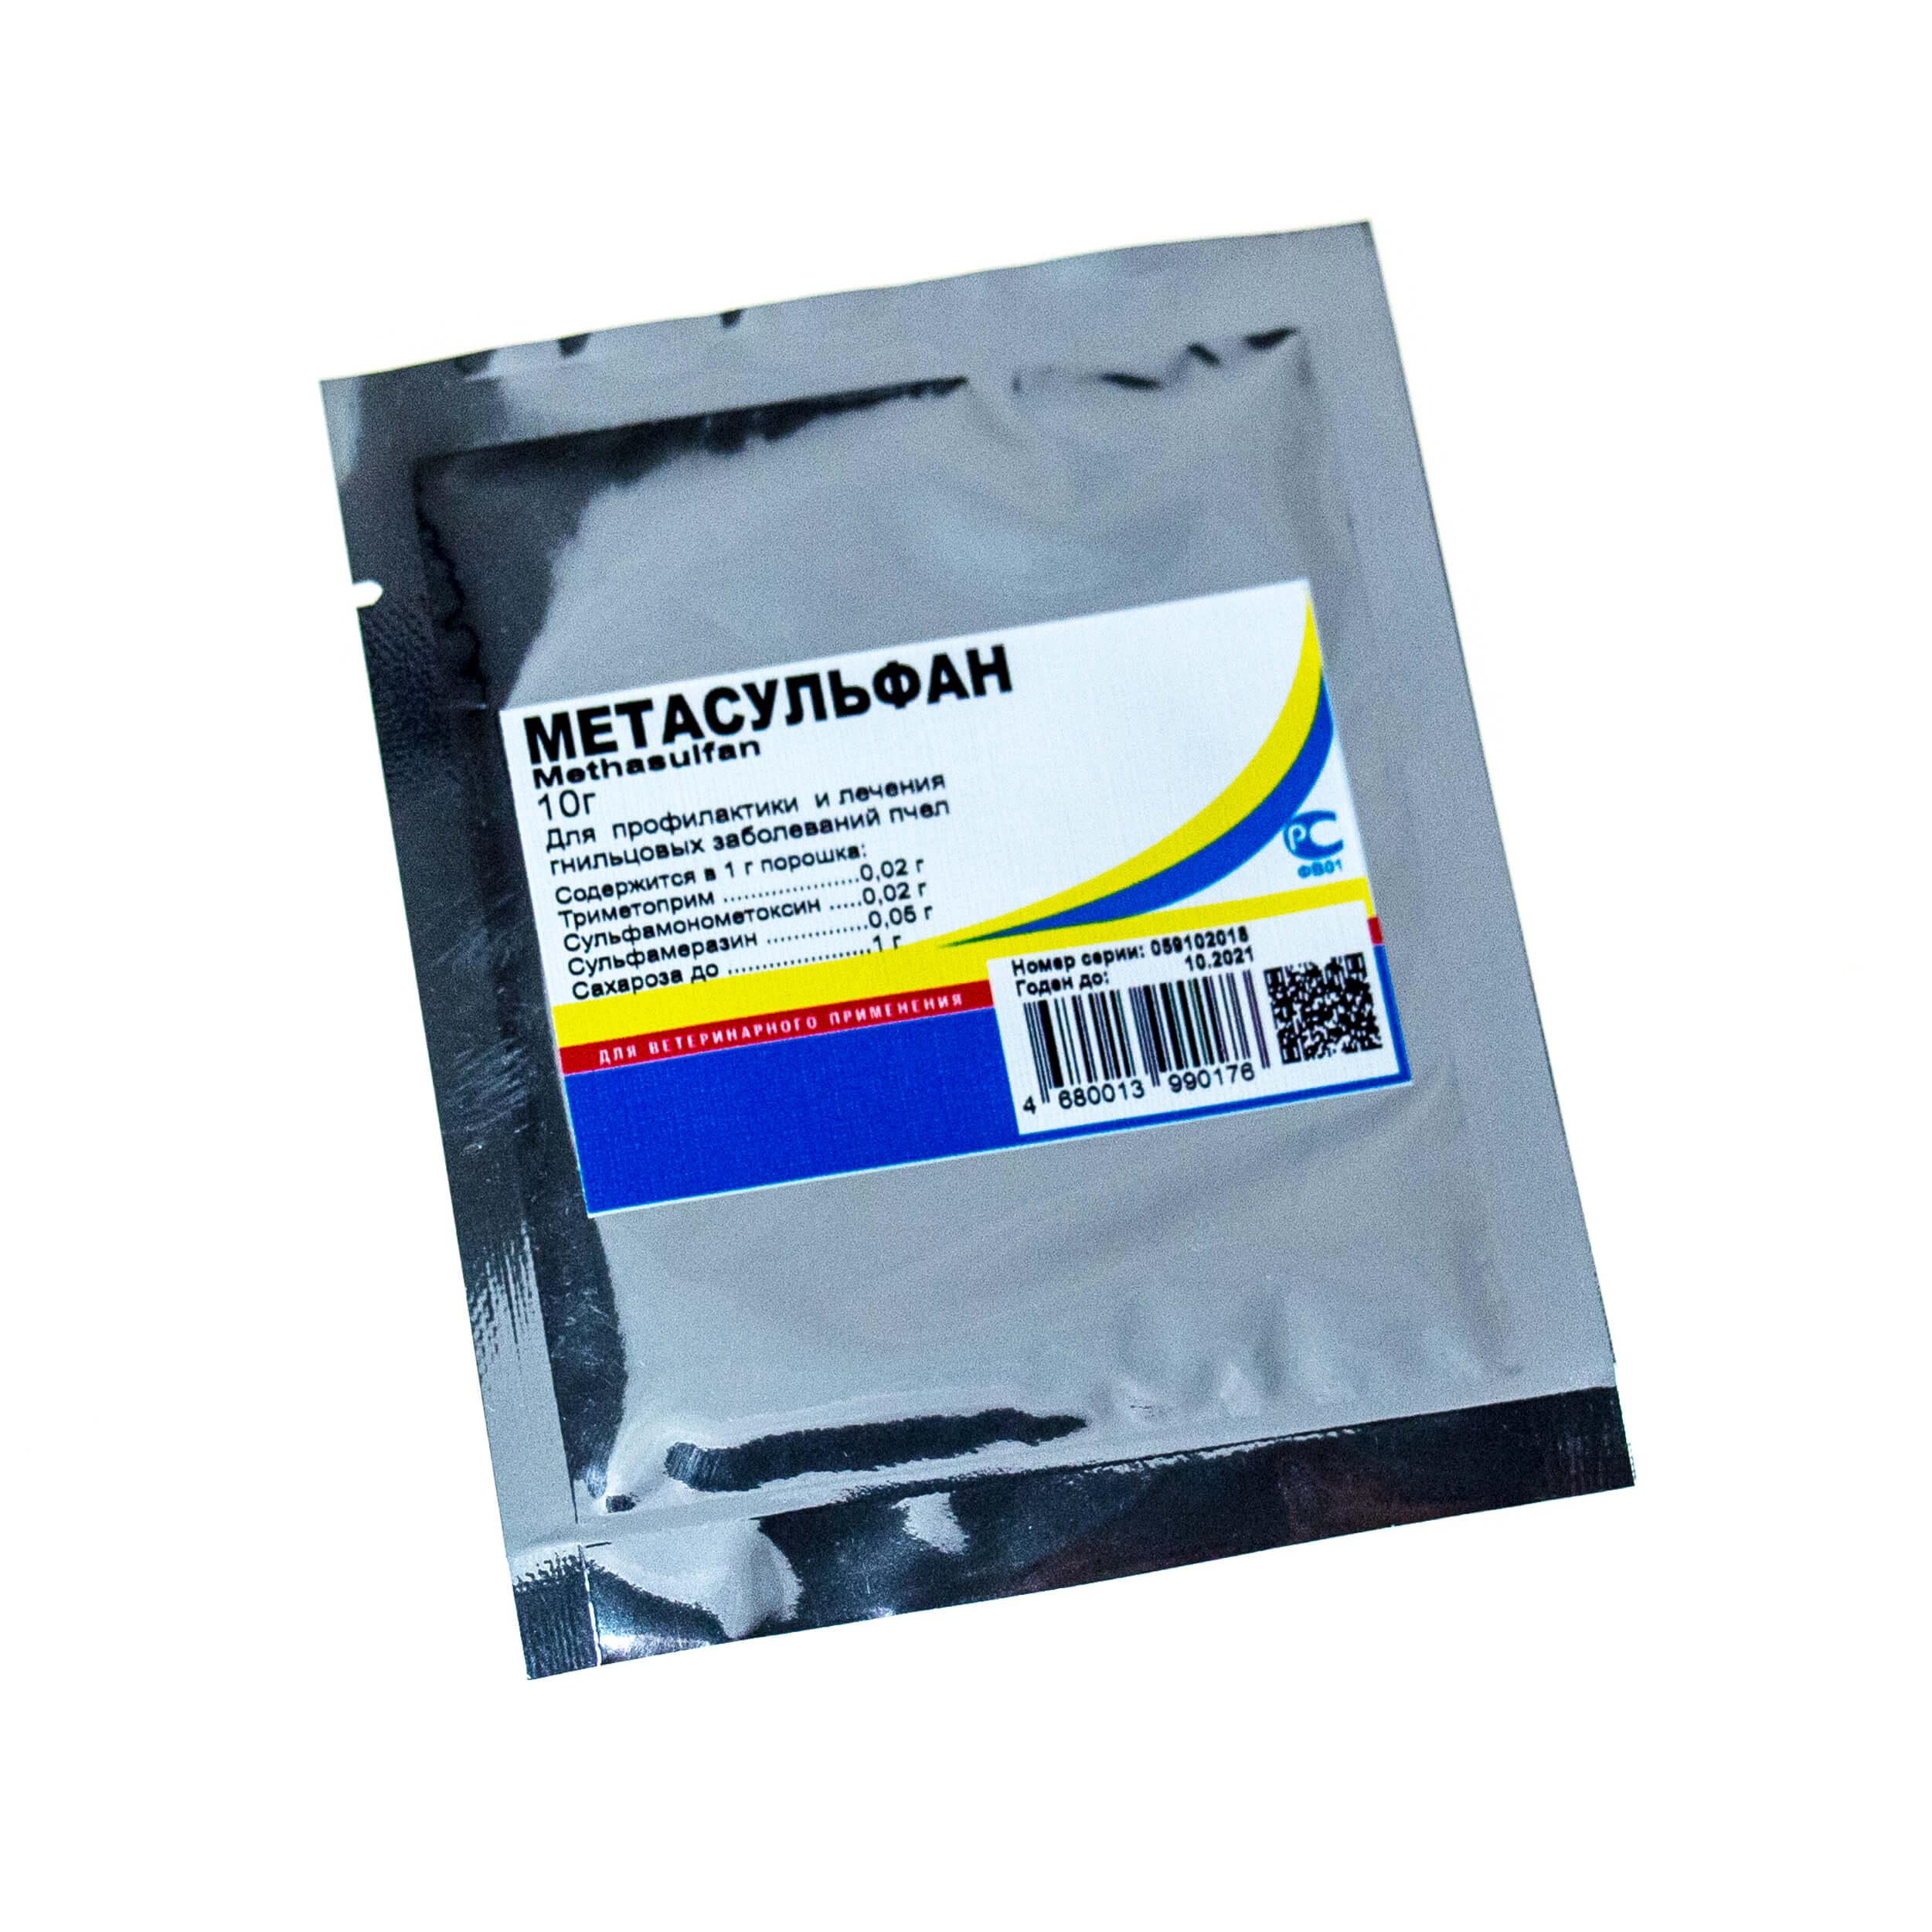 Метасульфан (Порошок, 10 гр) фото